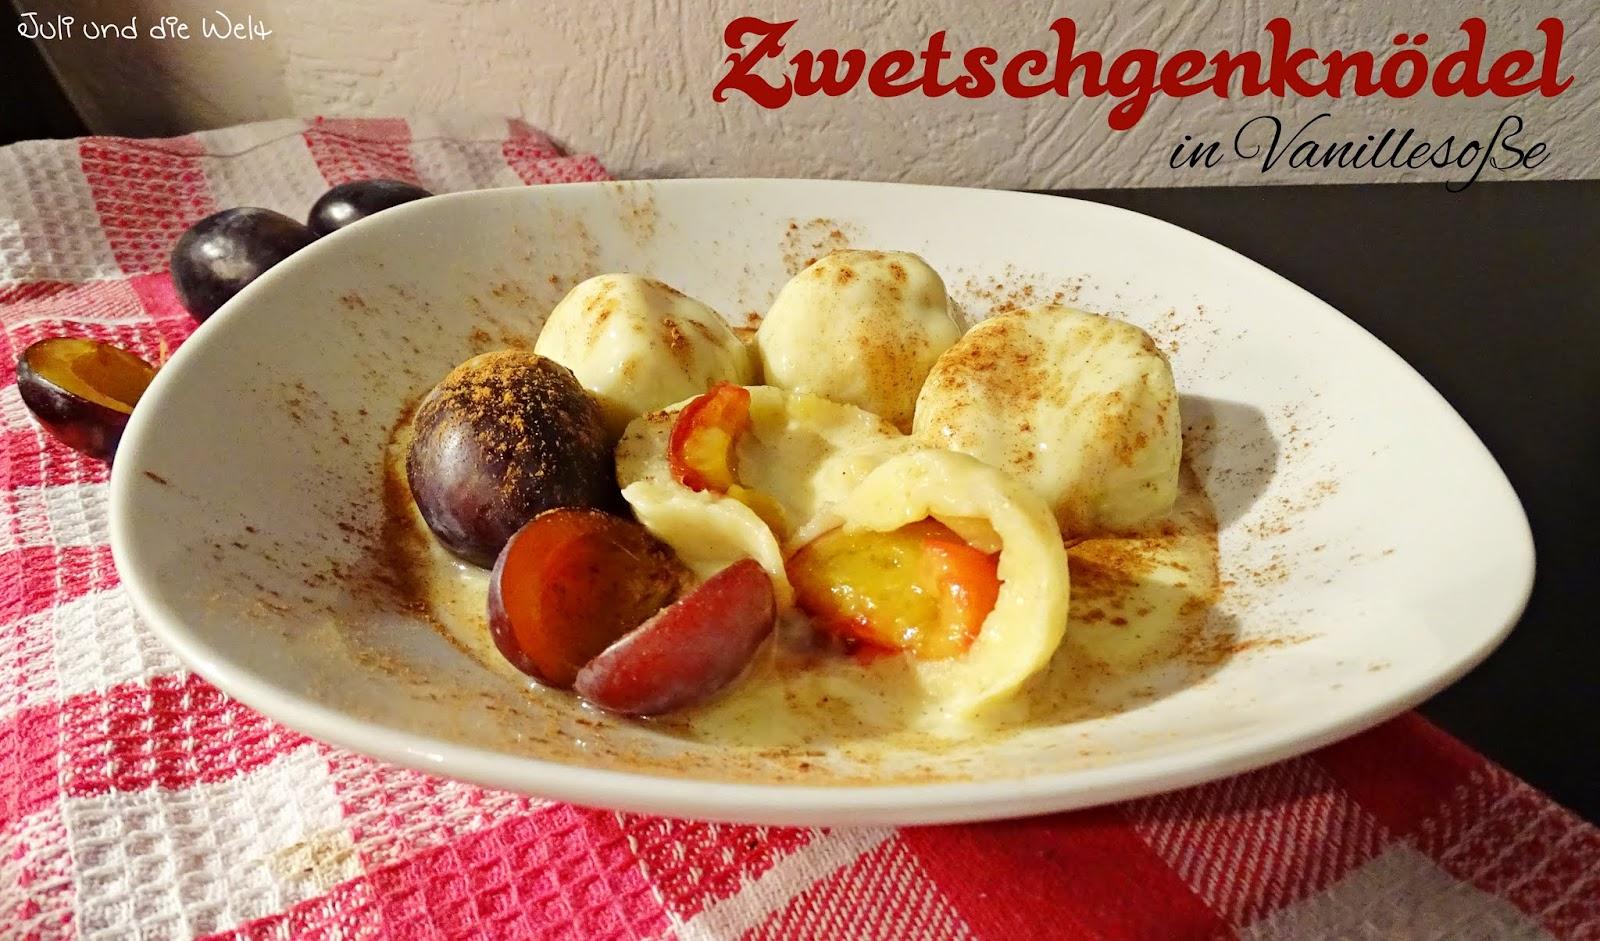 Juli´s Welt: Mein Lieblingsessen: Zwetschgenknödel {saisonale Küche}